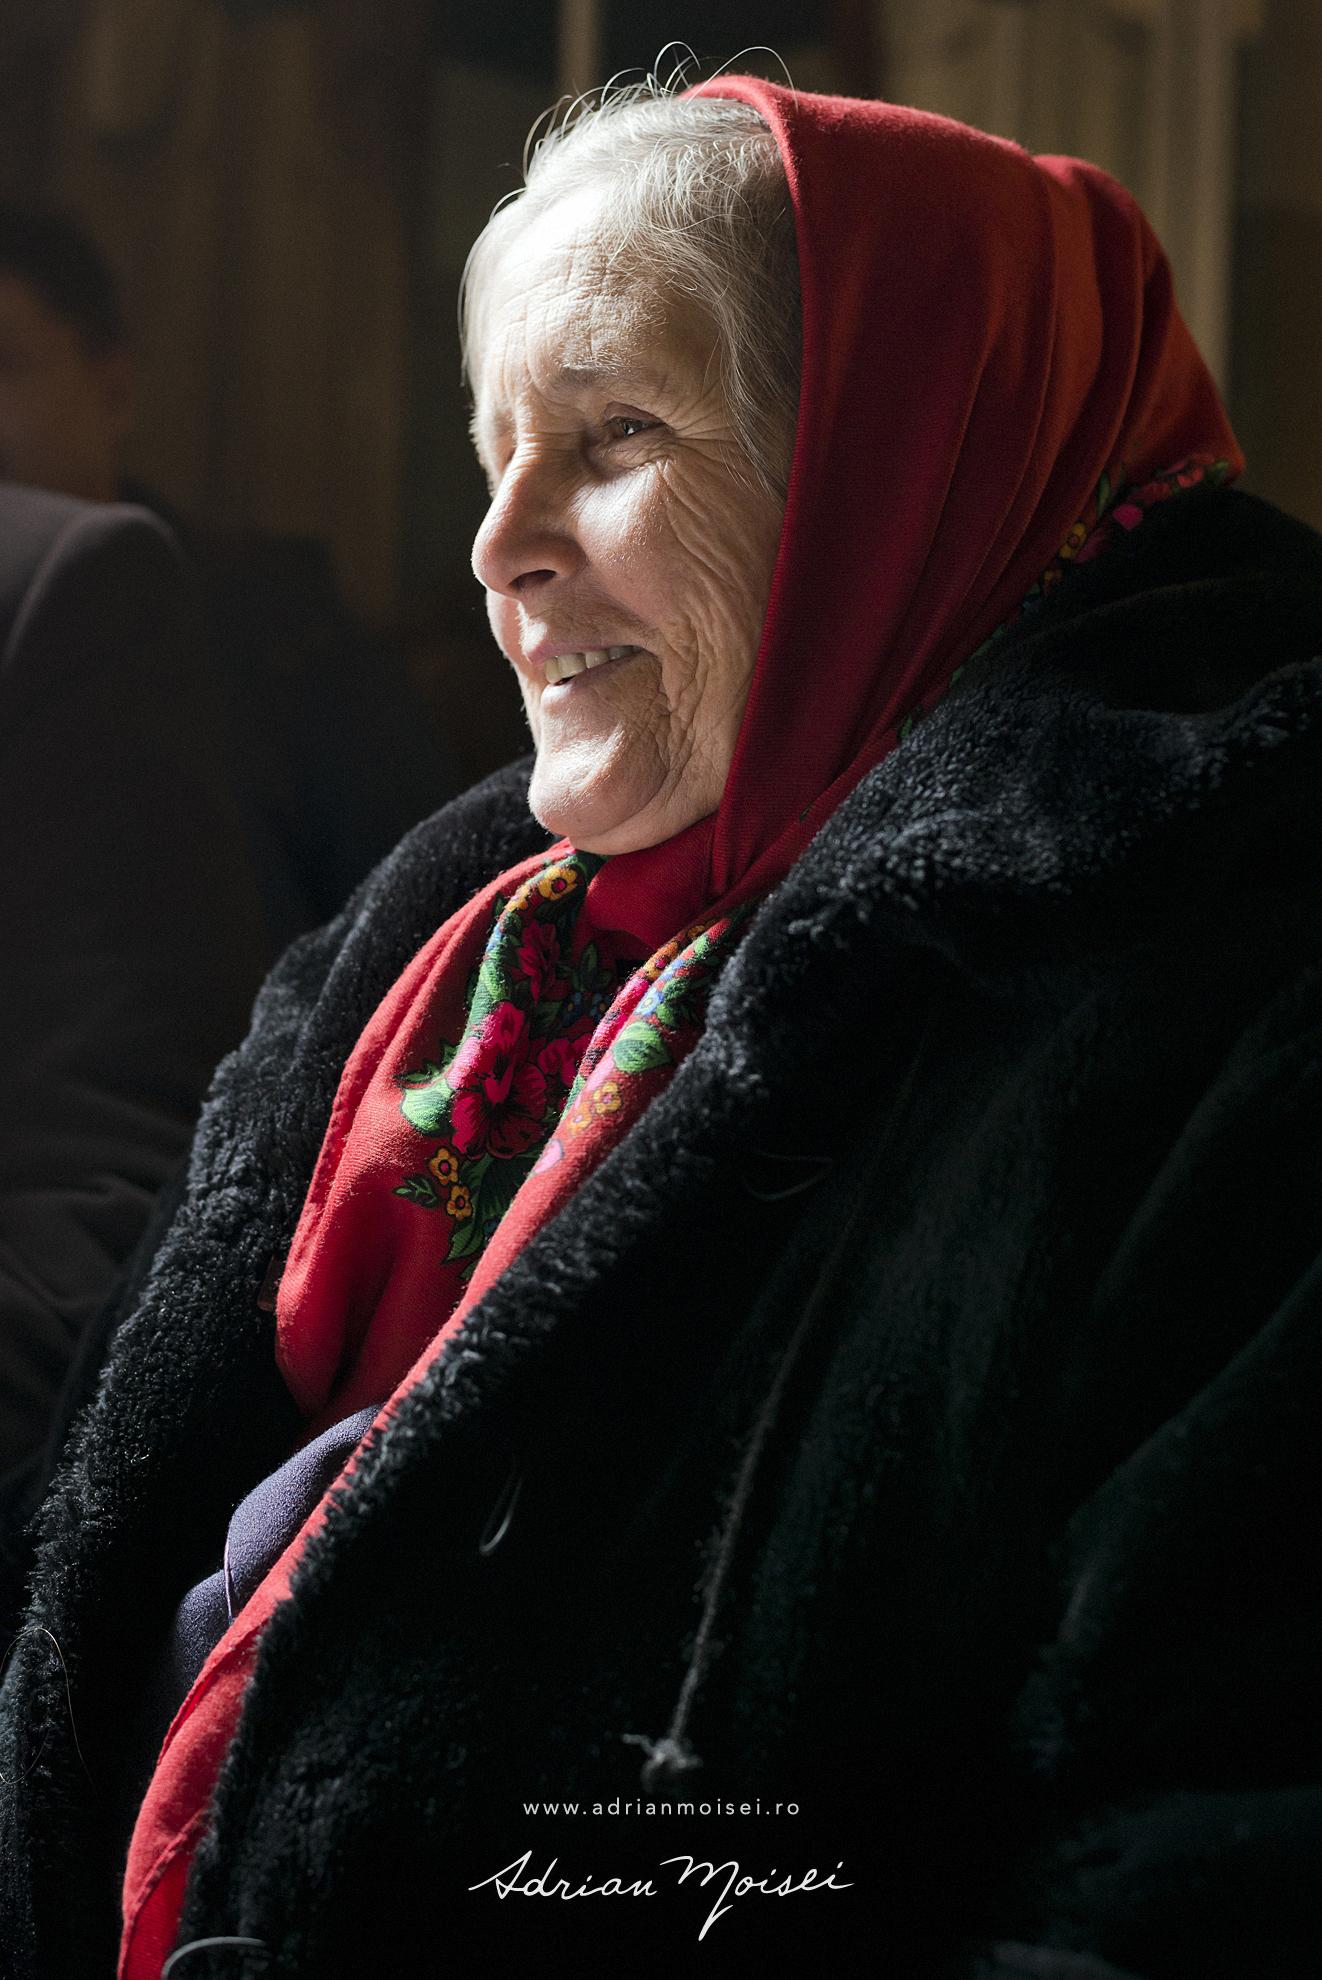 Portret de bunica realizat de Adrian Moisei, fotograf botez Iași